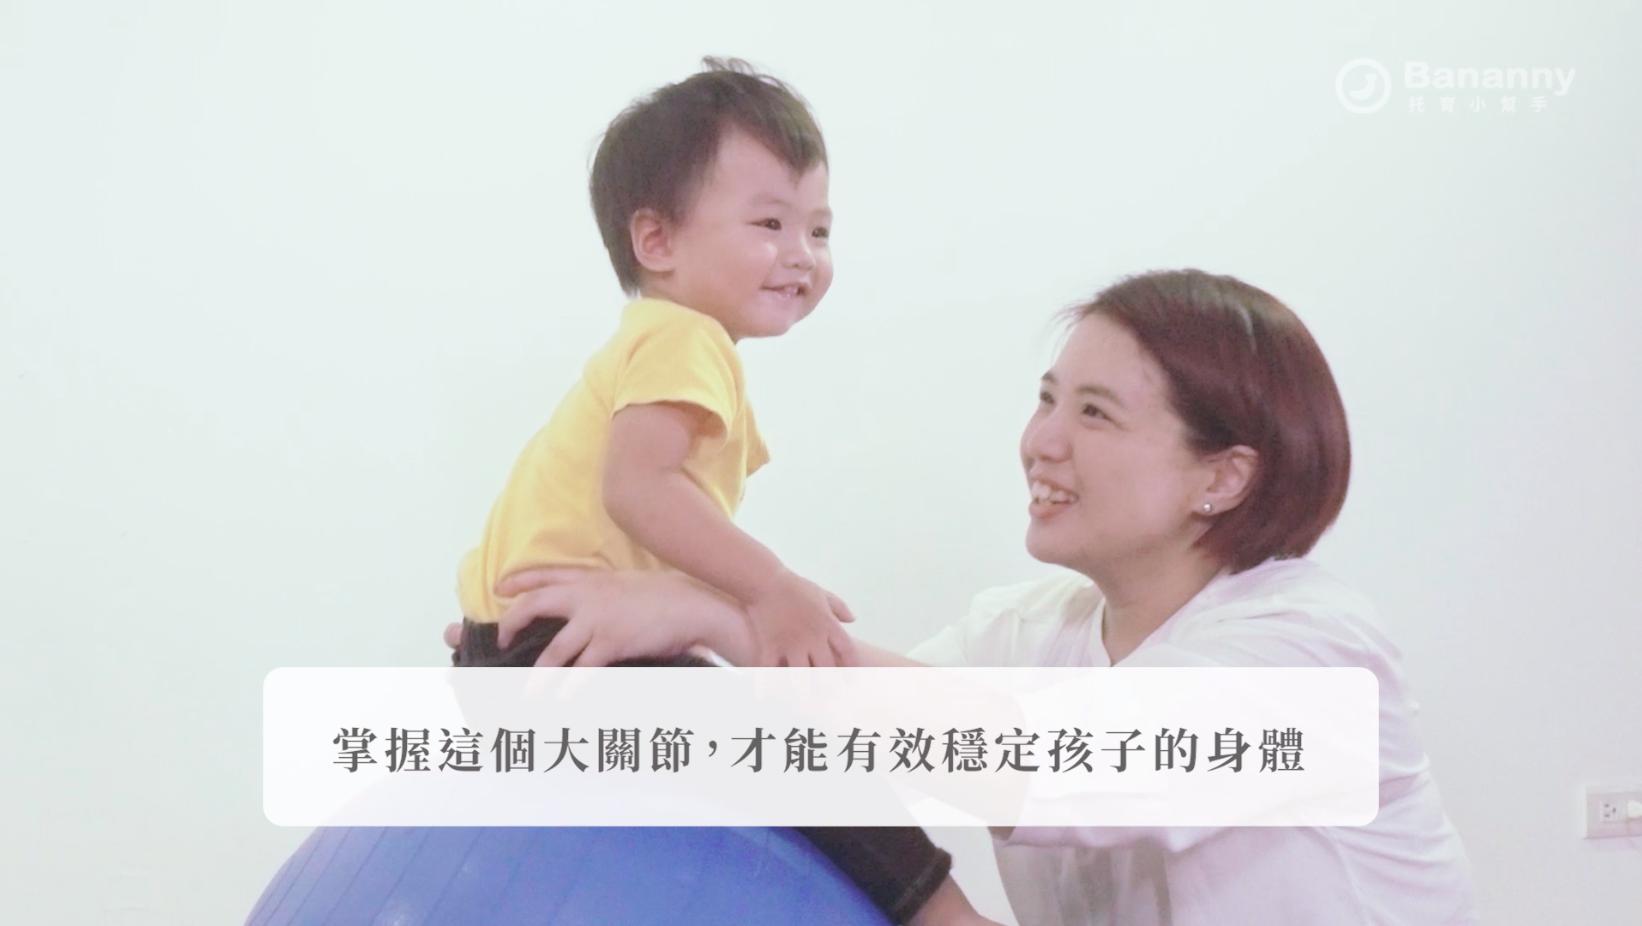 OT莉莉專欄:寶寶遊戲詳細步驟圖解!大球真是最棒玩具~